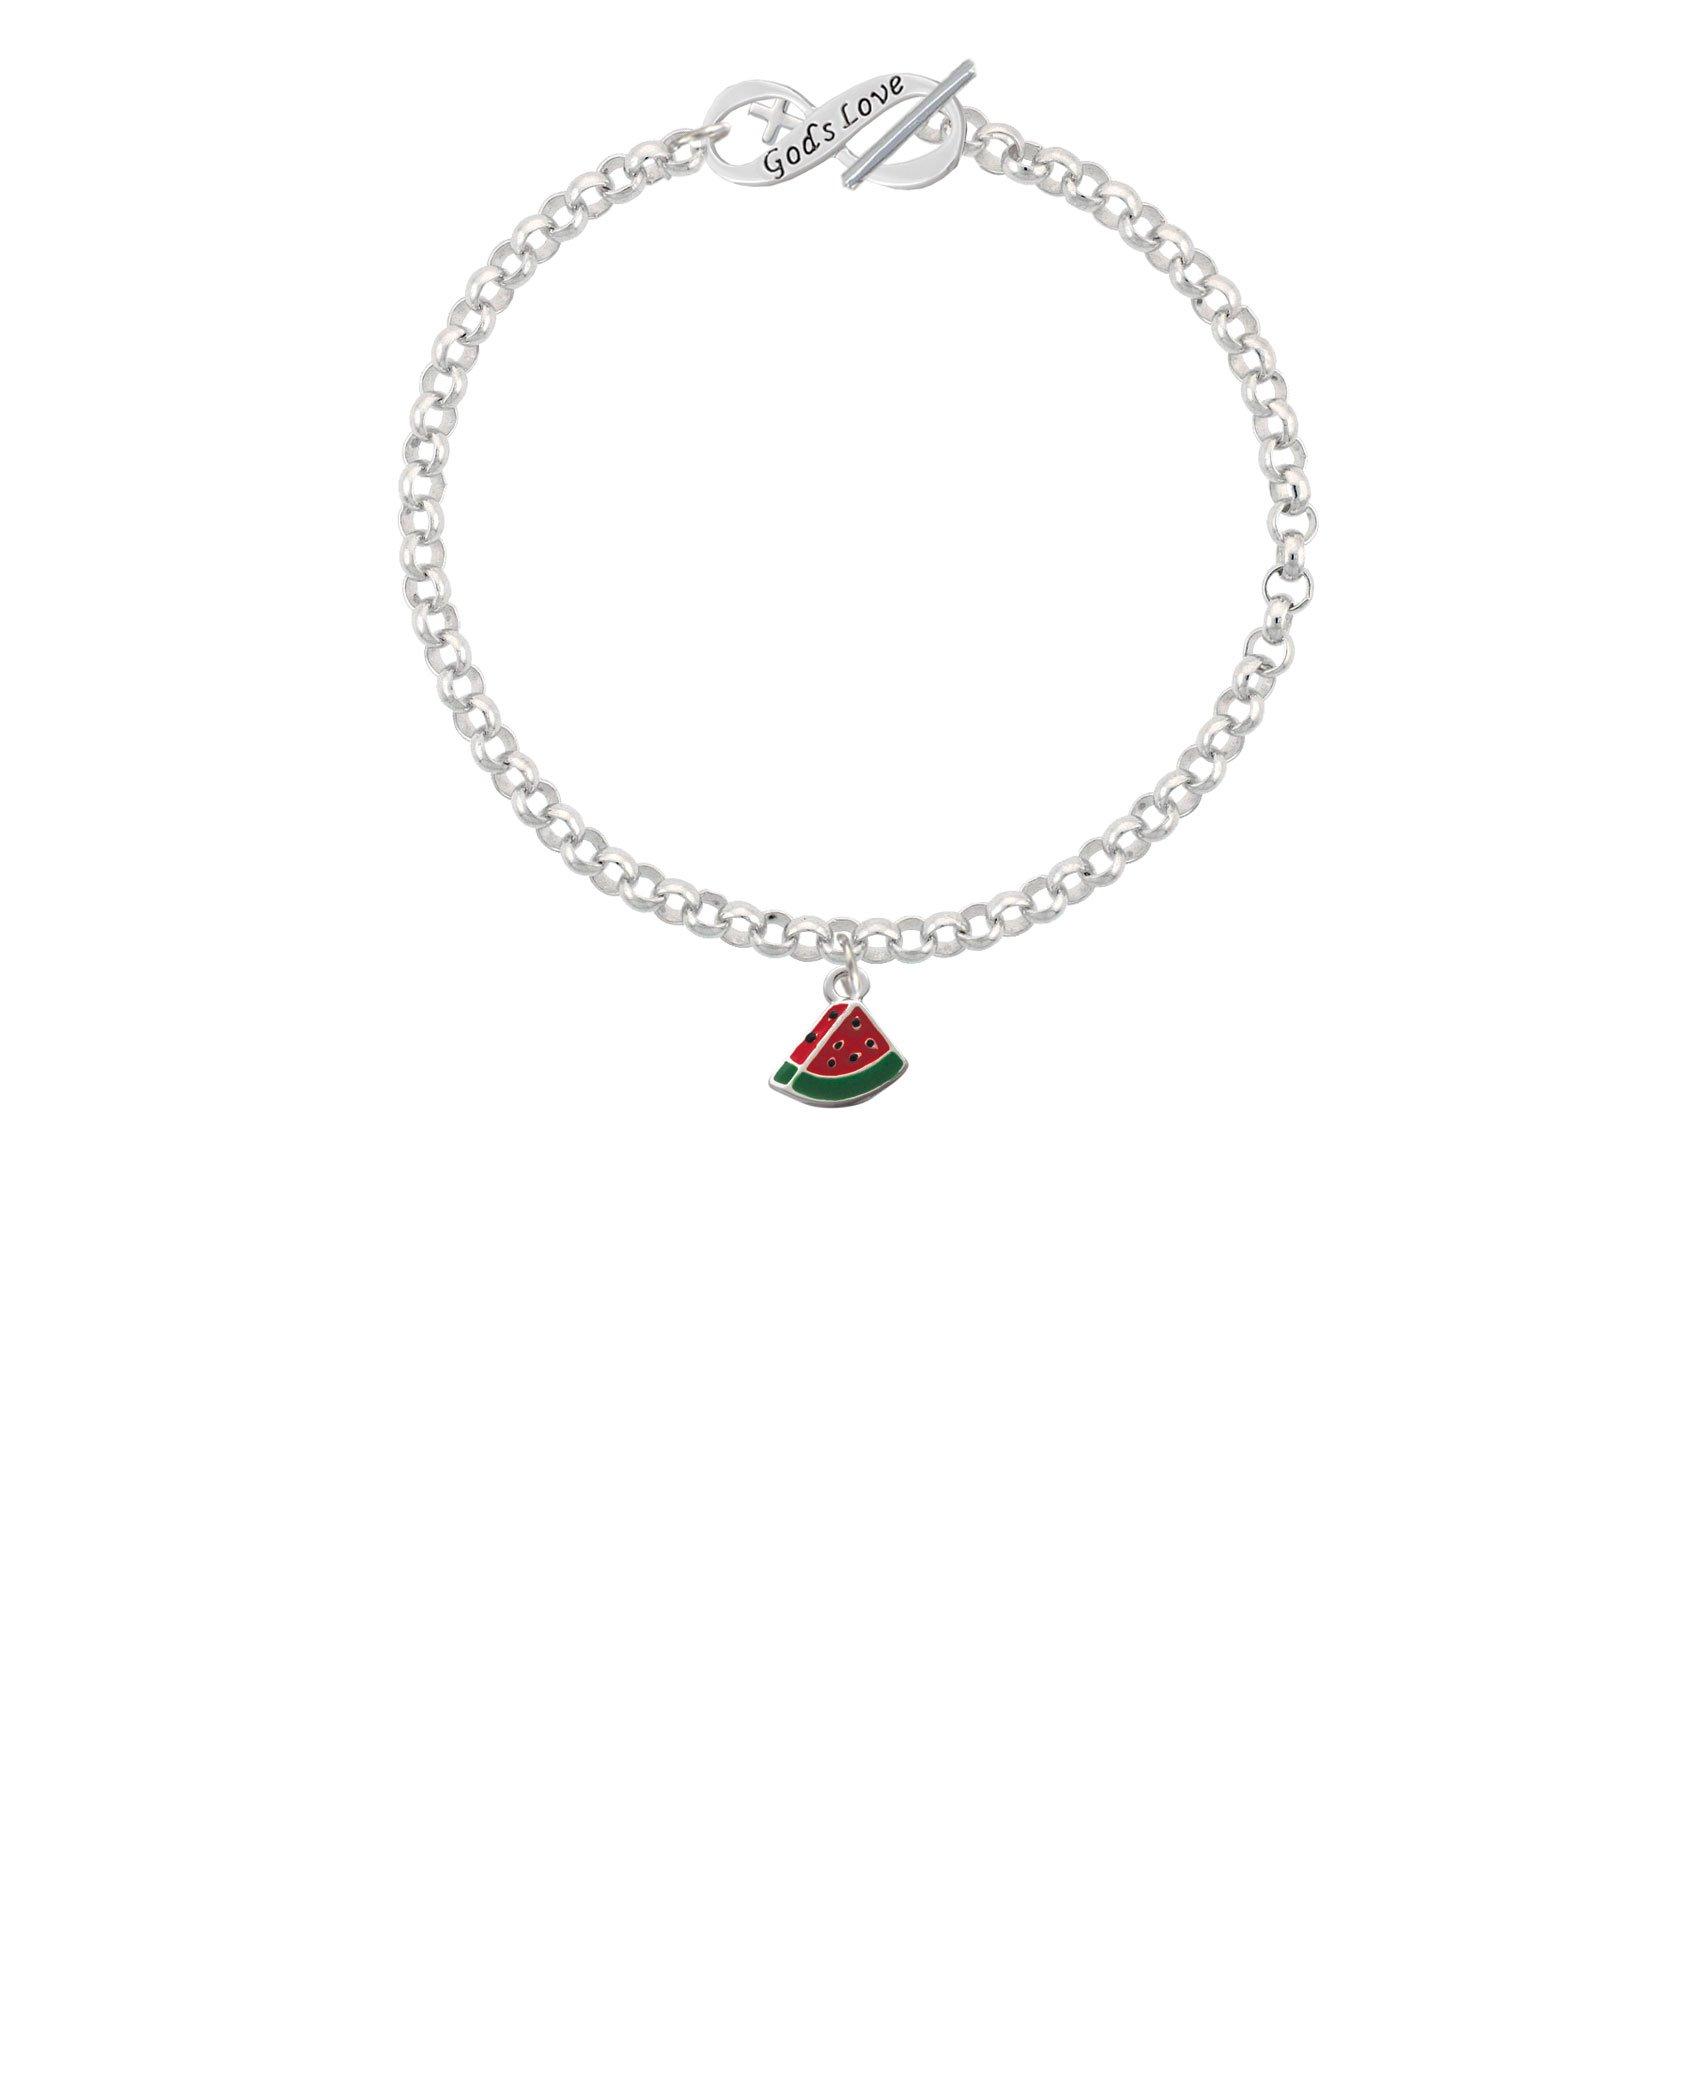 Silvertone Mini Enamel Watermelon Slice God's Love Infinity Toggle Chain Bracelet, 8''